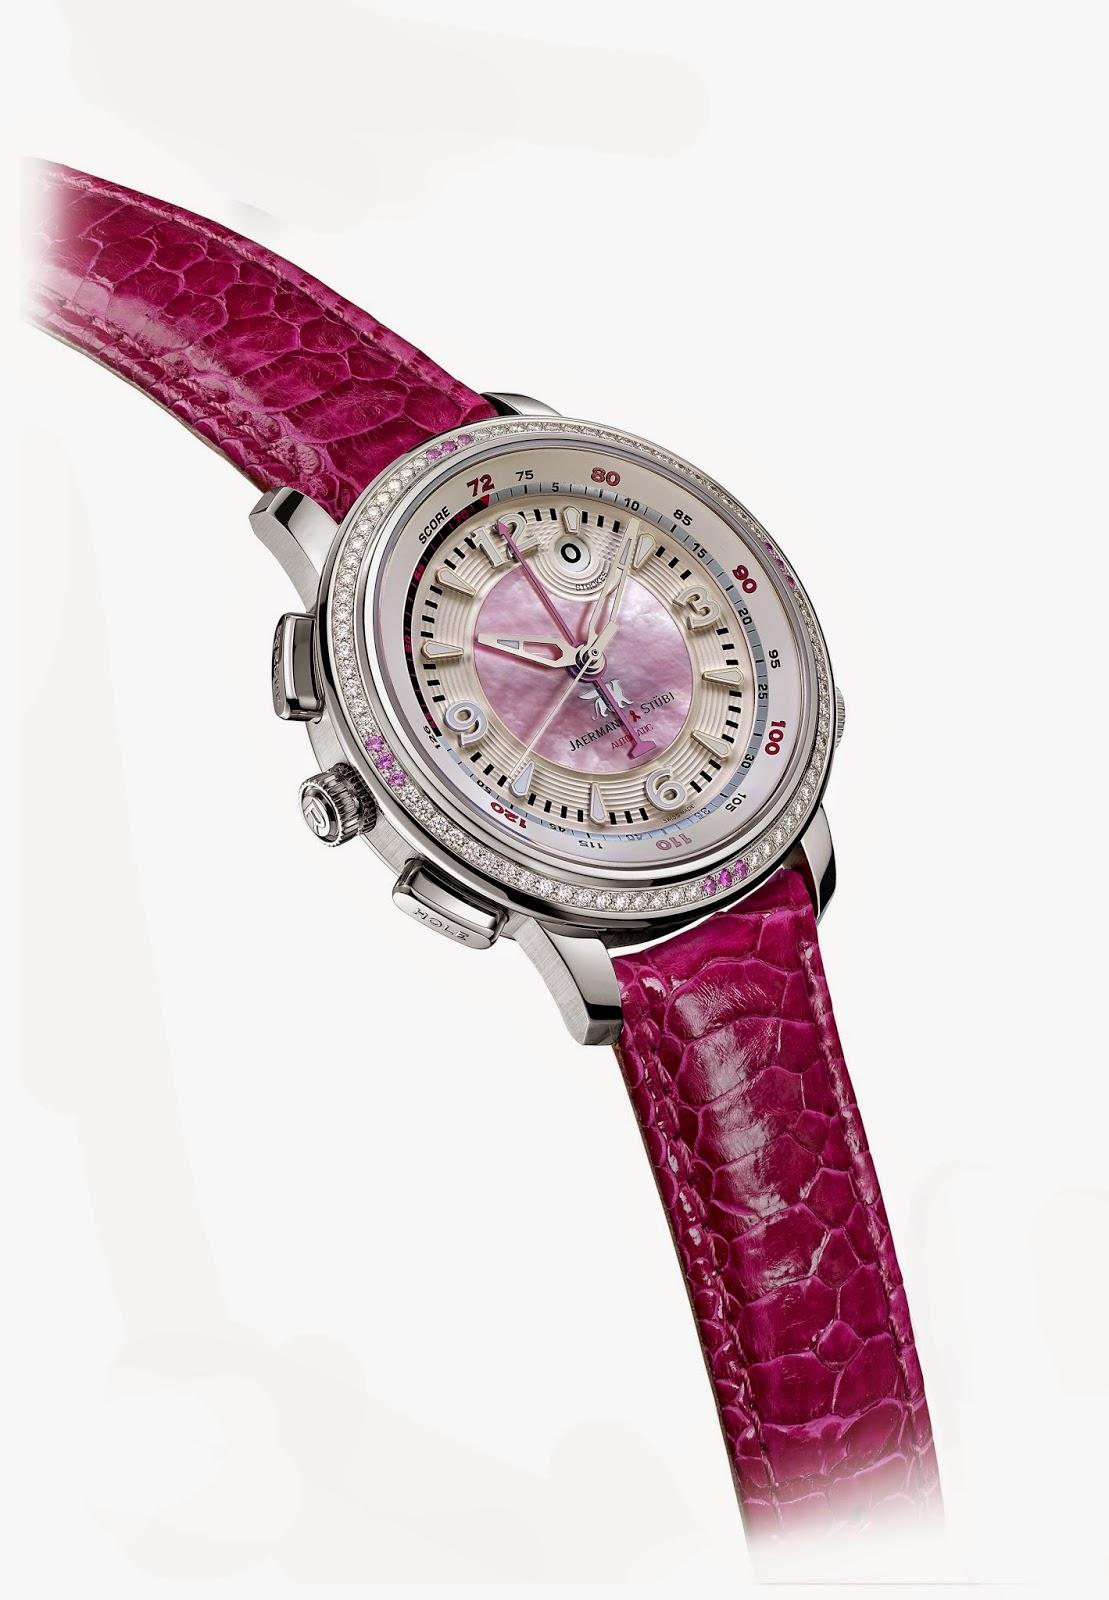 Jaermann & Stübi the The Timepiece Of Golf 1